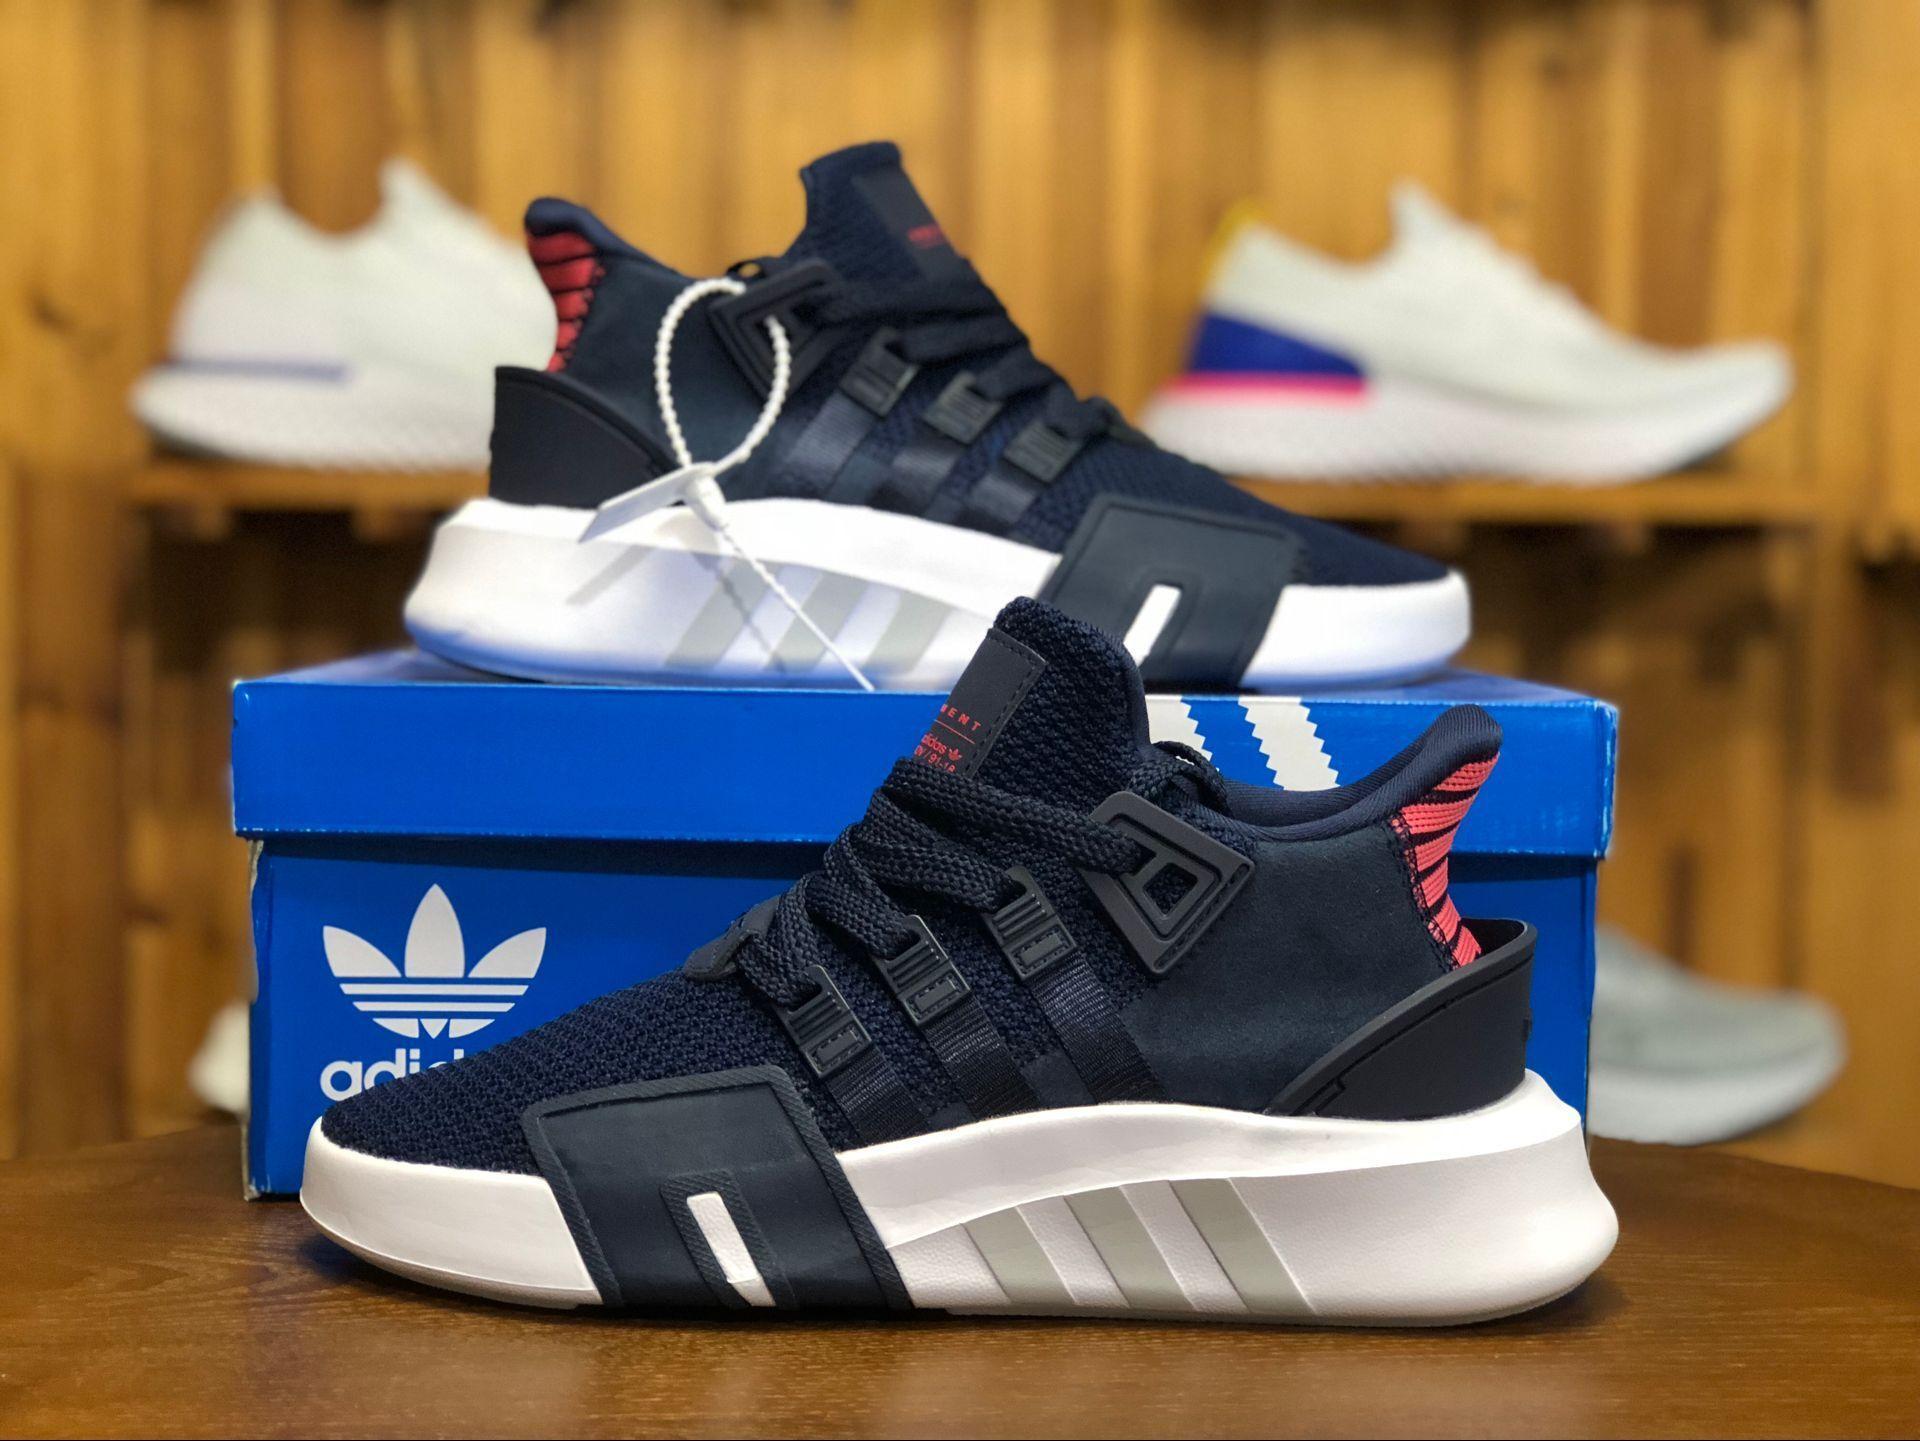 de838bbbee6 Adidas Originals EQT Basketball ADV Women and Men Lifestyle Shoes CQ2996 Navy  Blue